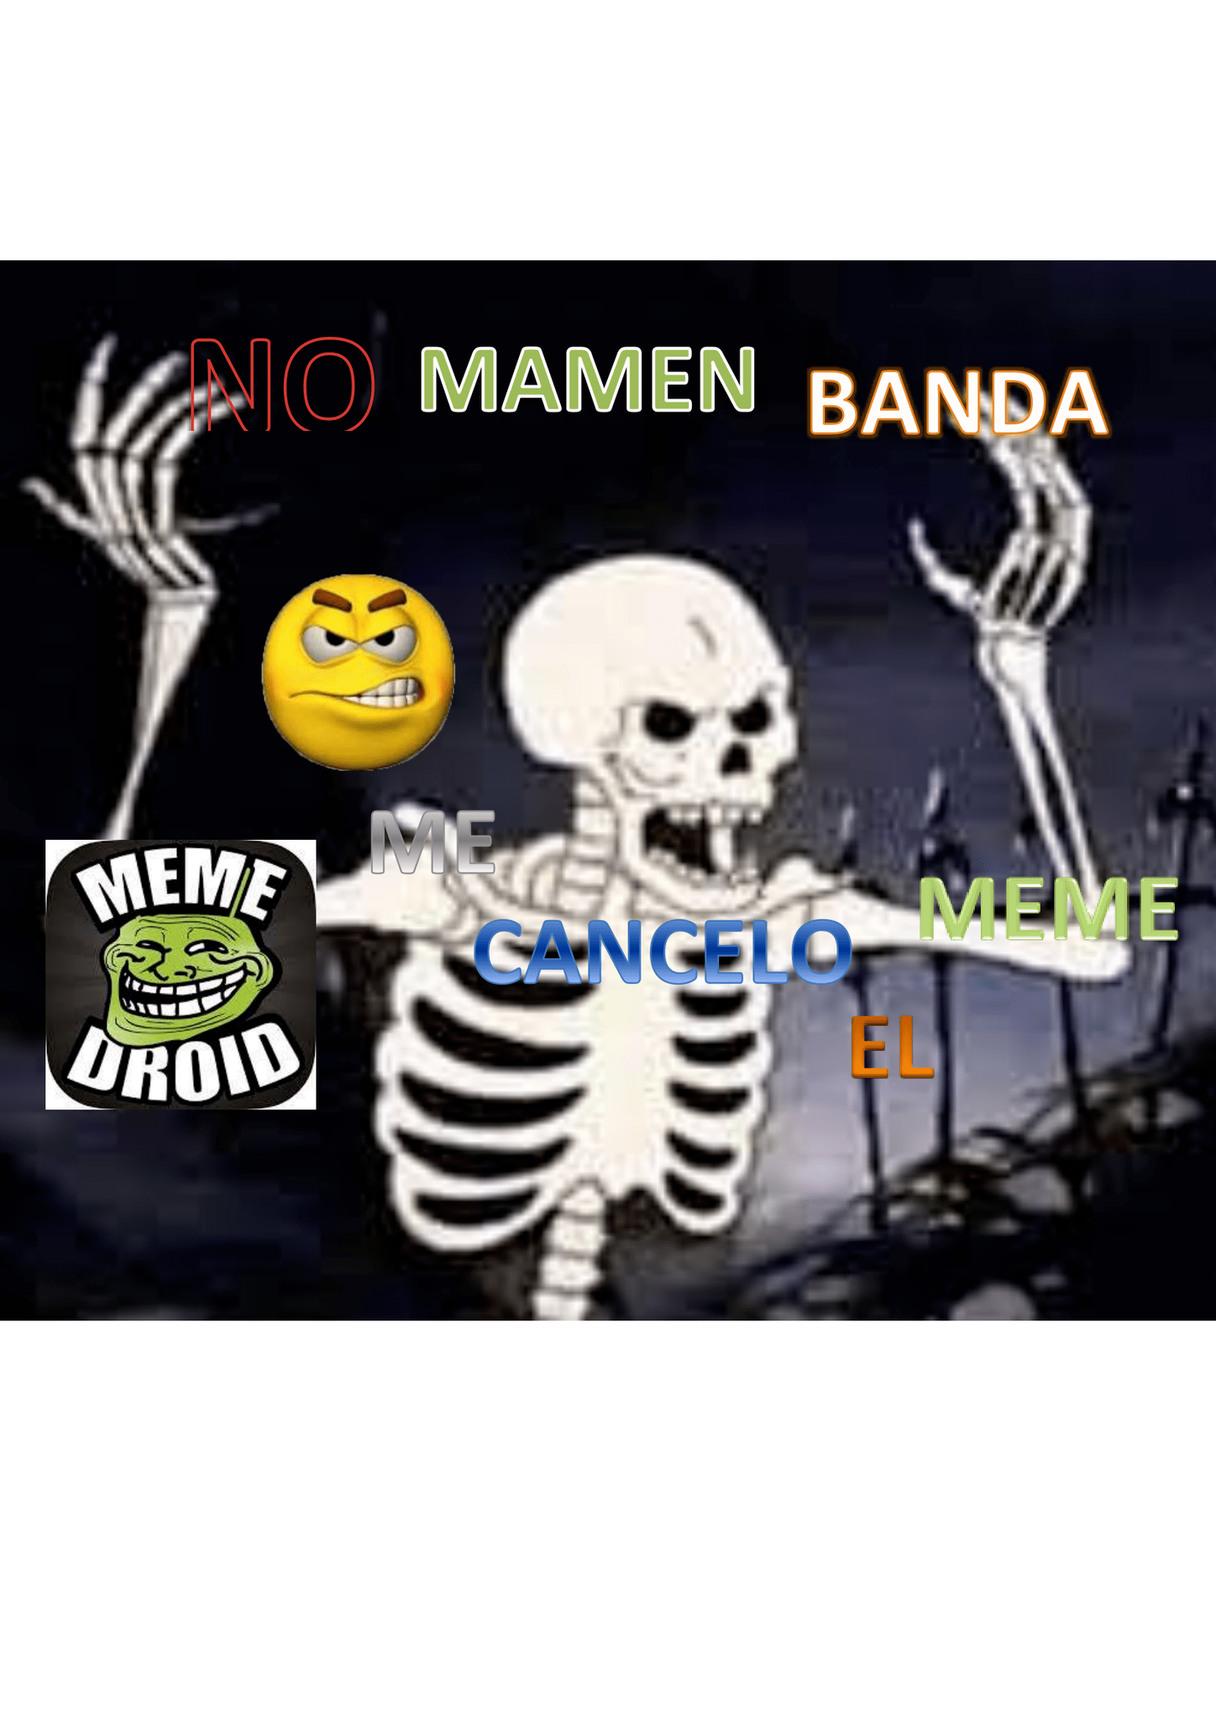 Memedroid dejamelo subir for favor :¨(